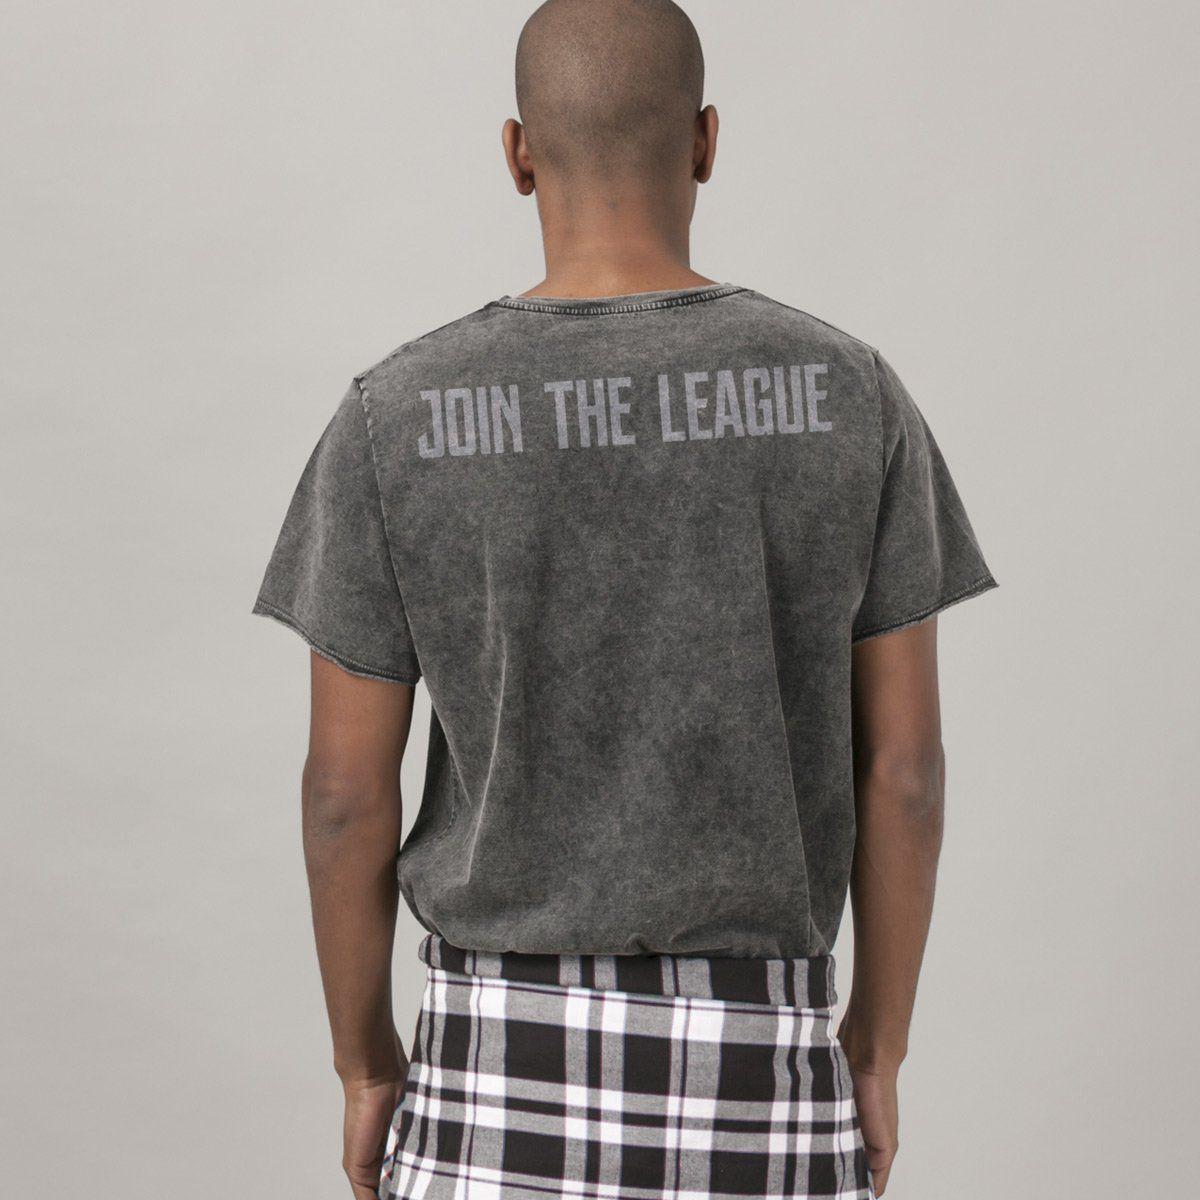 T-shirt Marmorizada Liga da Justiça Symbols  - bandUP Store Marketplace